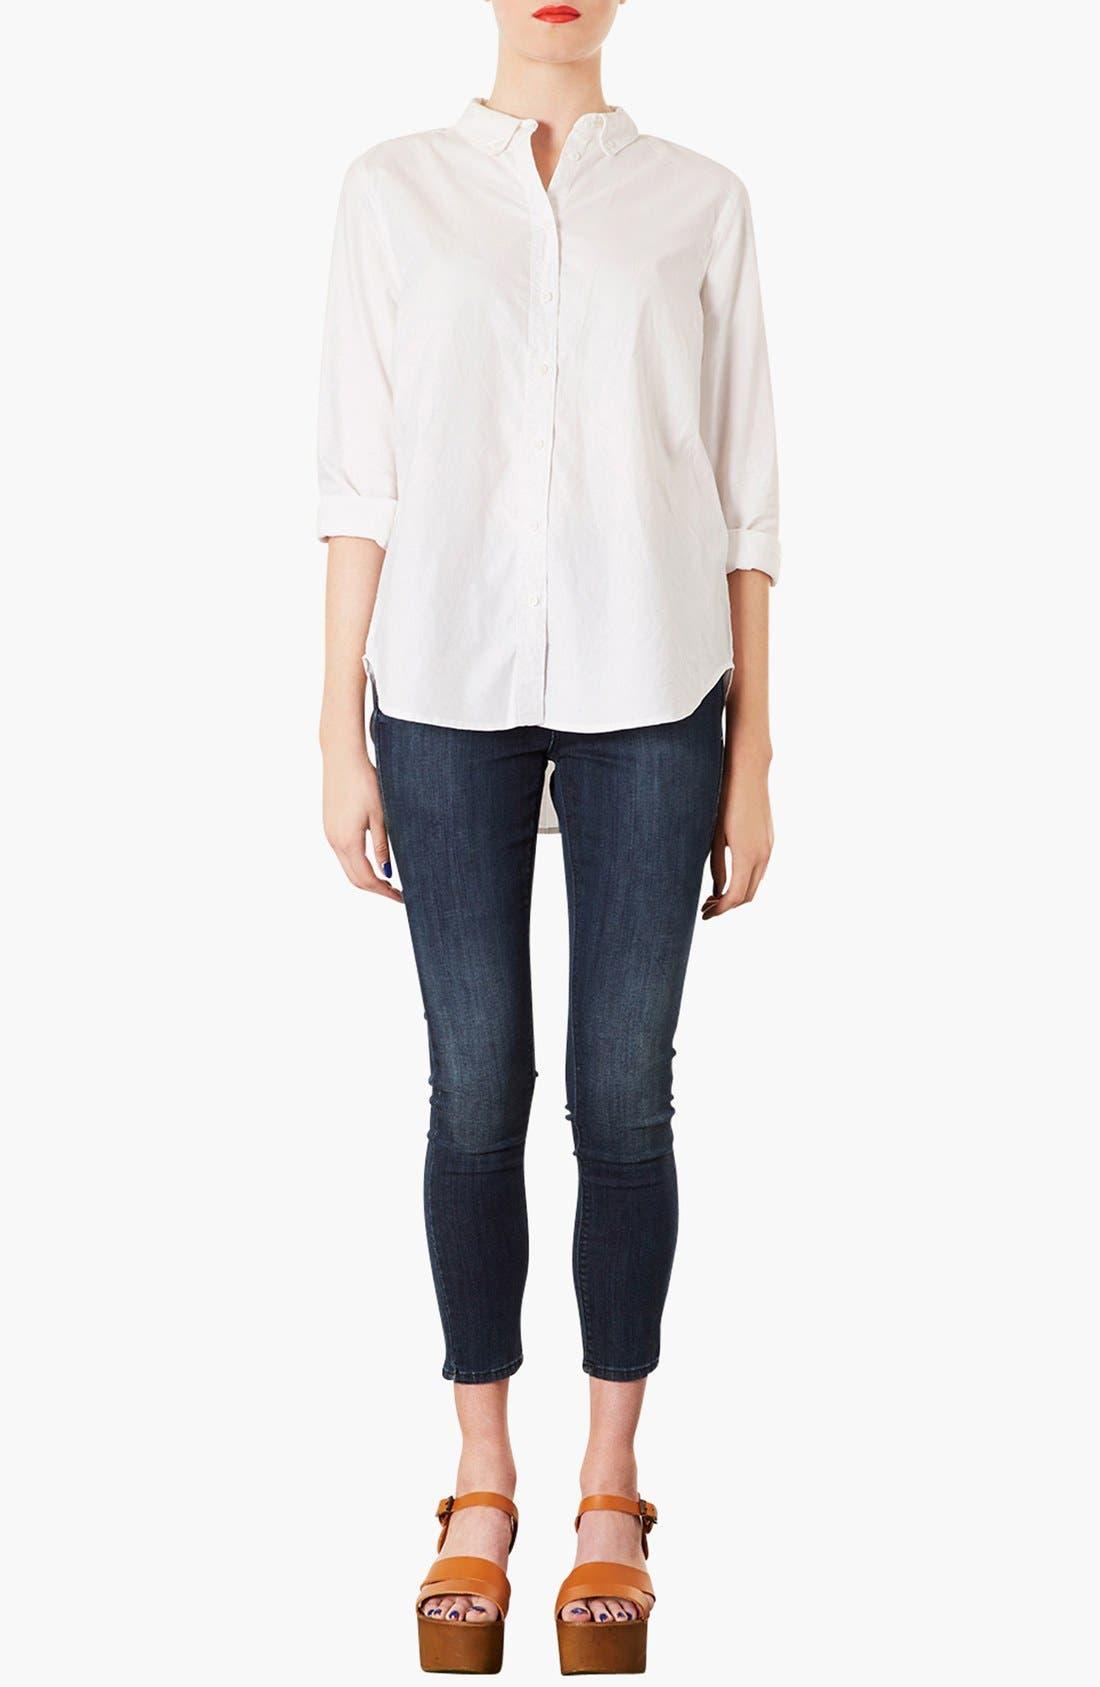 TOPSHOP, Woven Oxford Shirt, Alternate thumbnail 4, color, 100